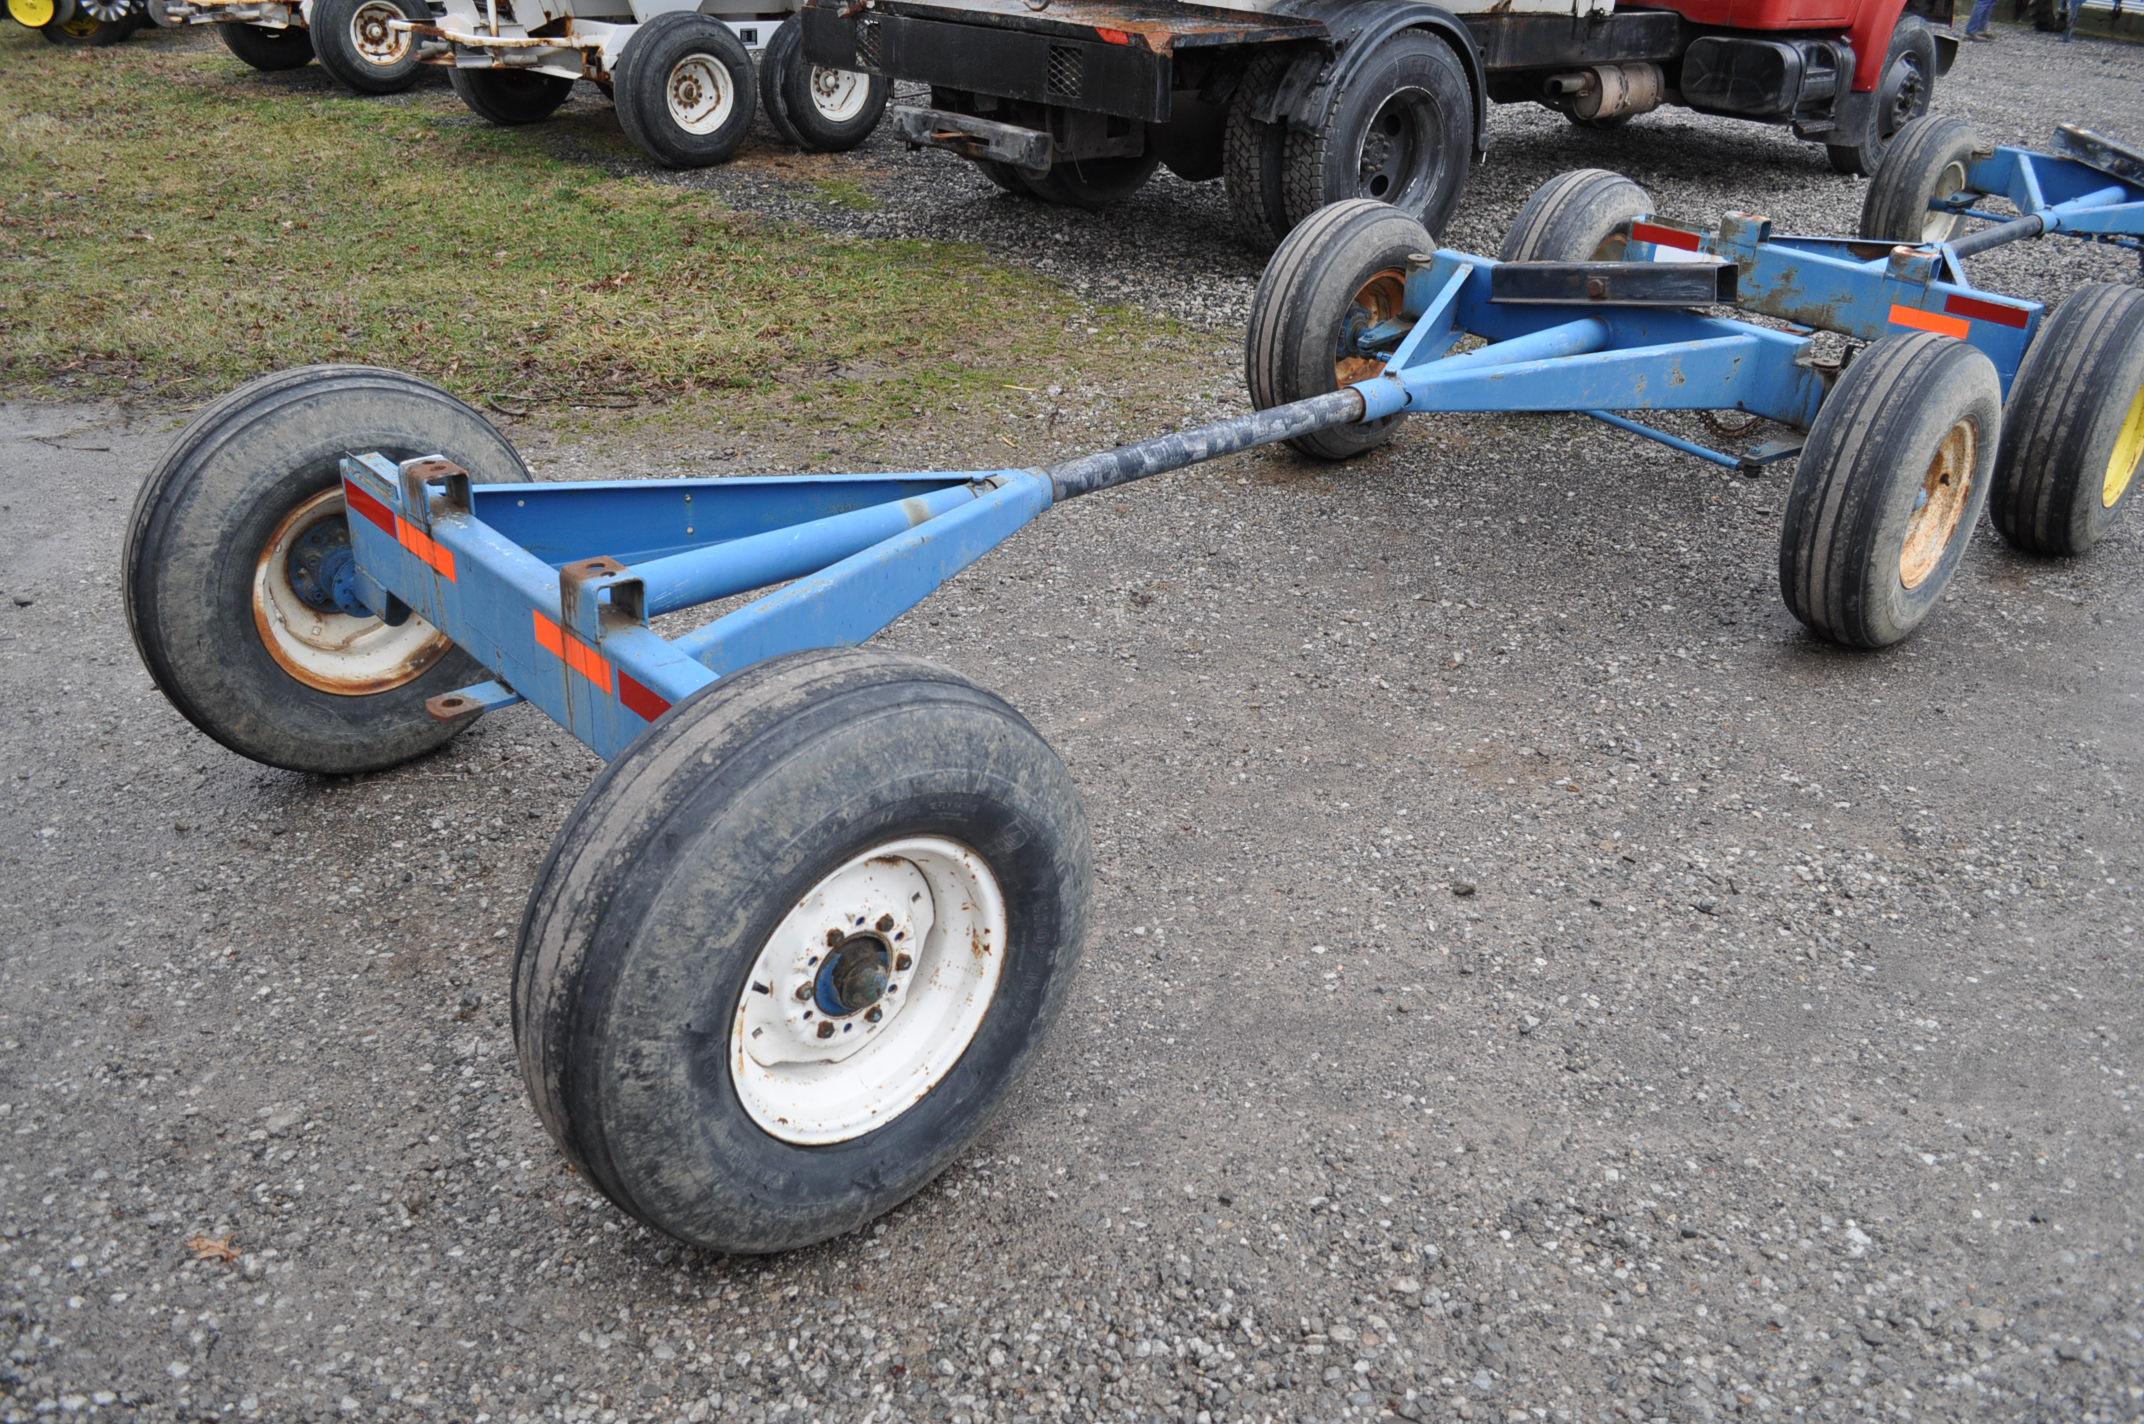 NH3 wagon gear - Image 4 of 8